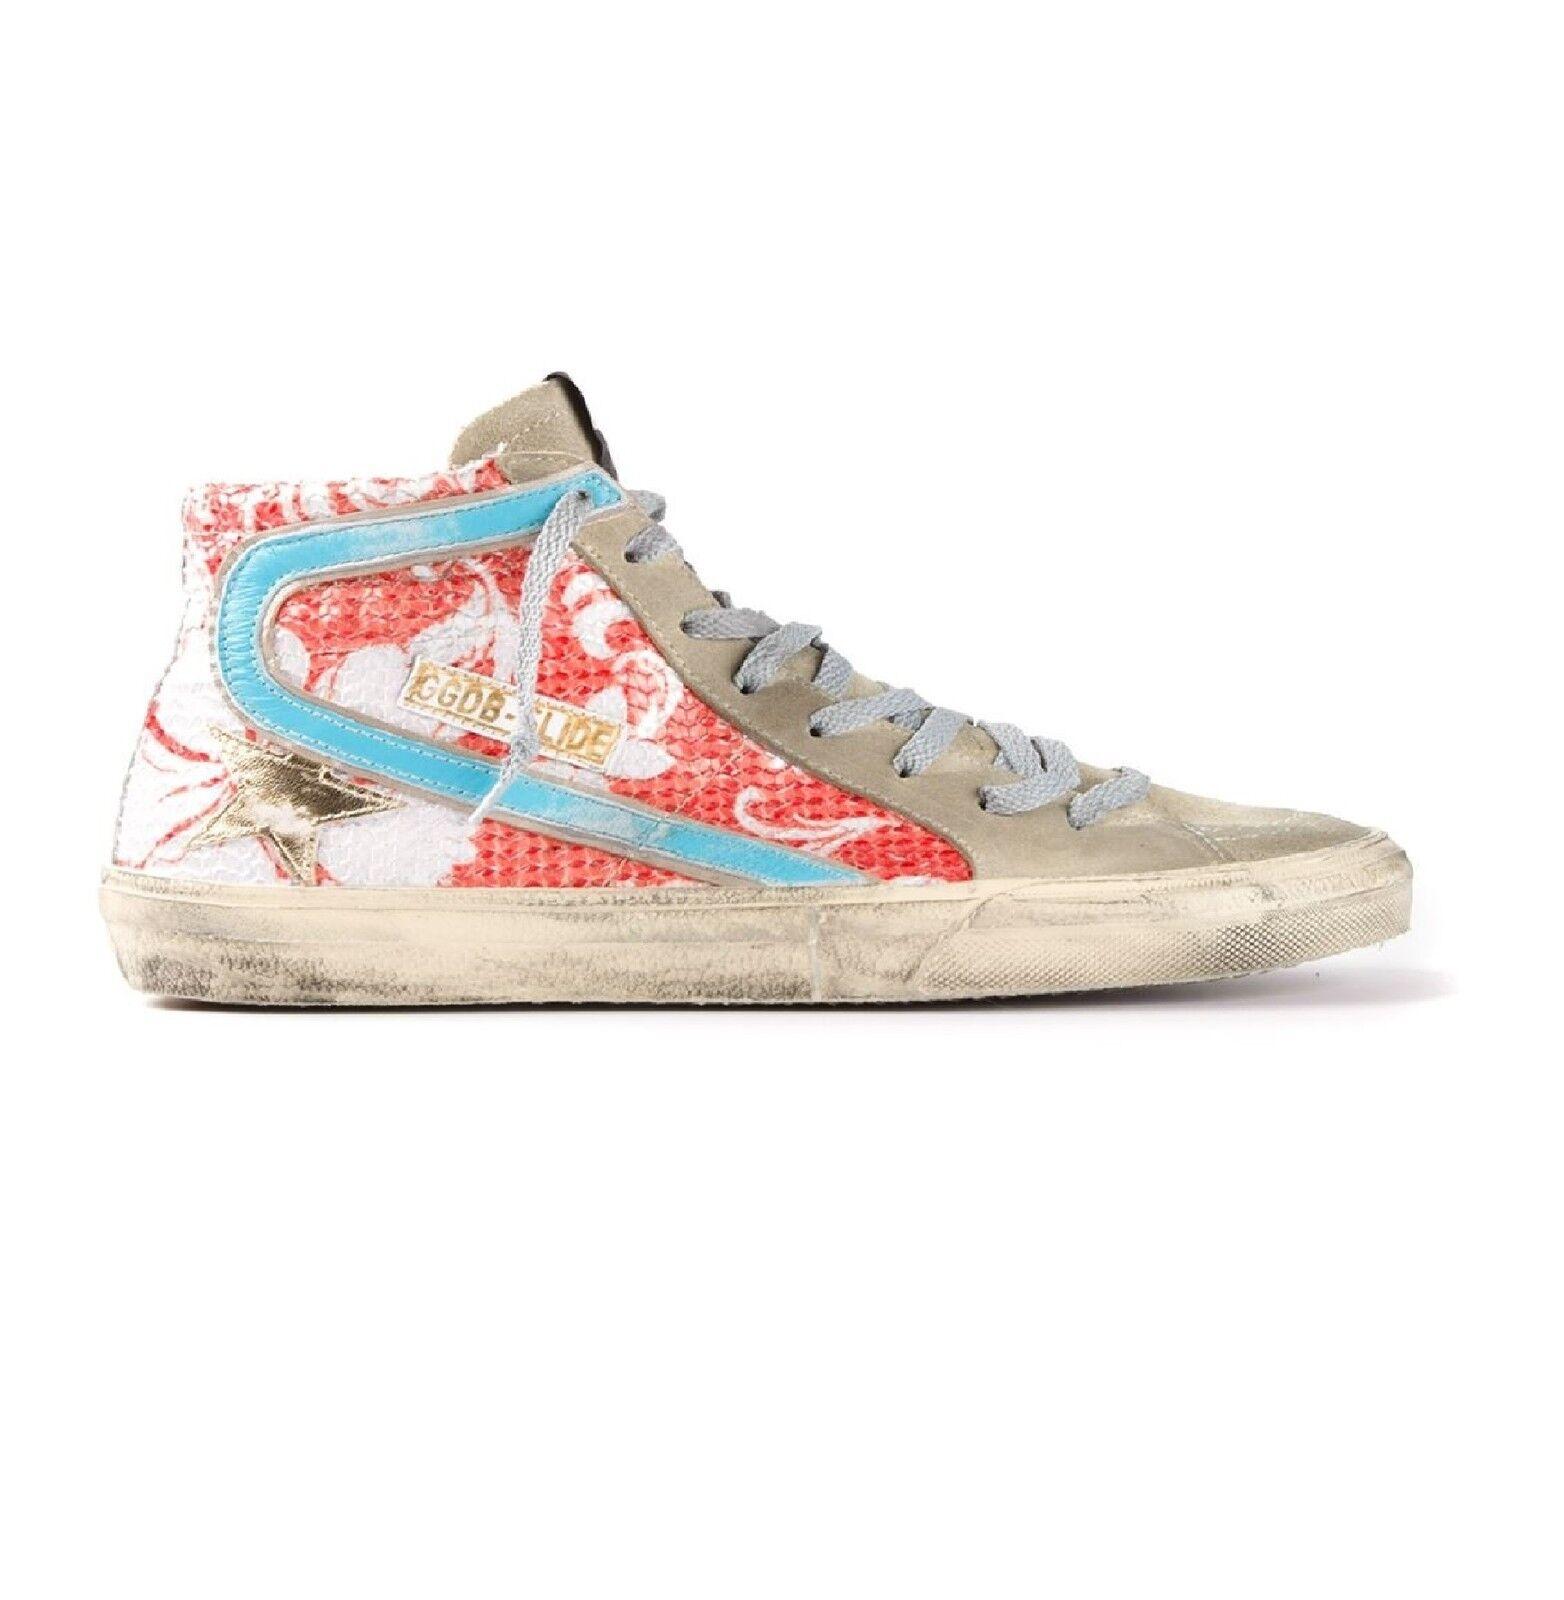 Zapatos casuales salvajes ORIGINAL GOLDEN GOOSE Sneaker GGDB Slide G24D124.H2 Corail Paillettes 35 *NEUF*